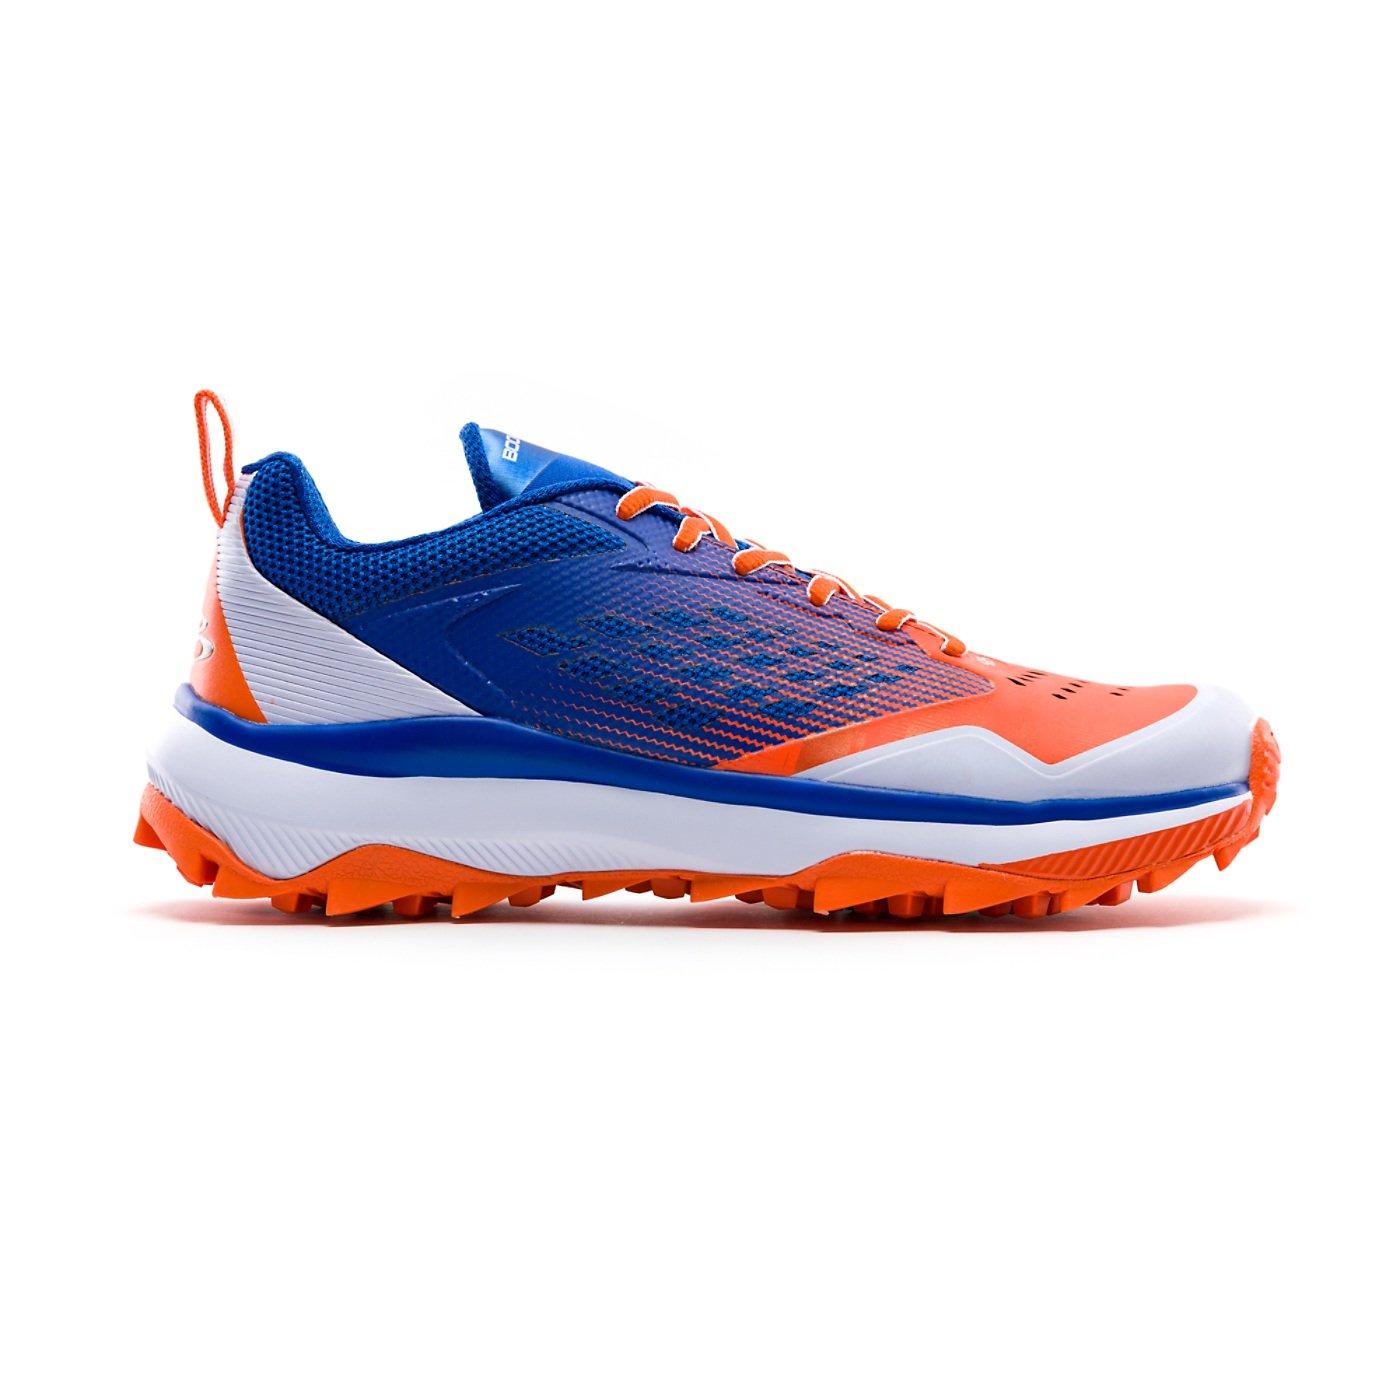 Boombah Men 's Marauder Turf Shoes – 8カラーオプション – 複数のサイズ B07BS35NNZ 10.5|ロイヤル/オレンジ ロイヤル/オレンジ 10.5